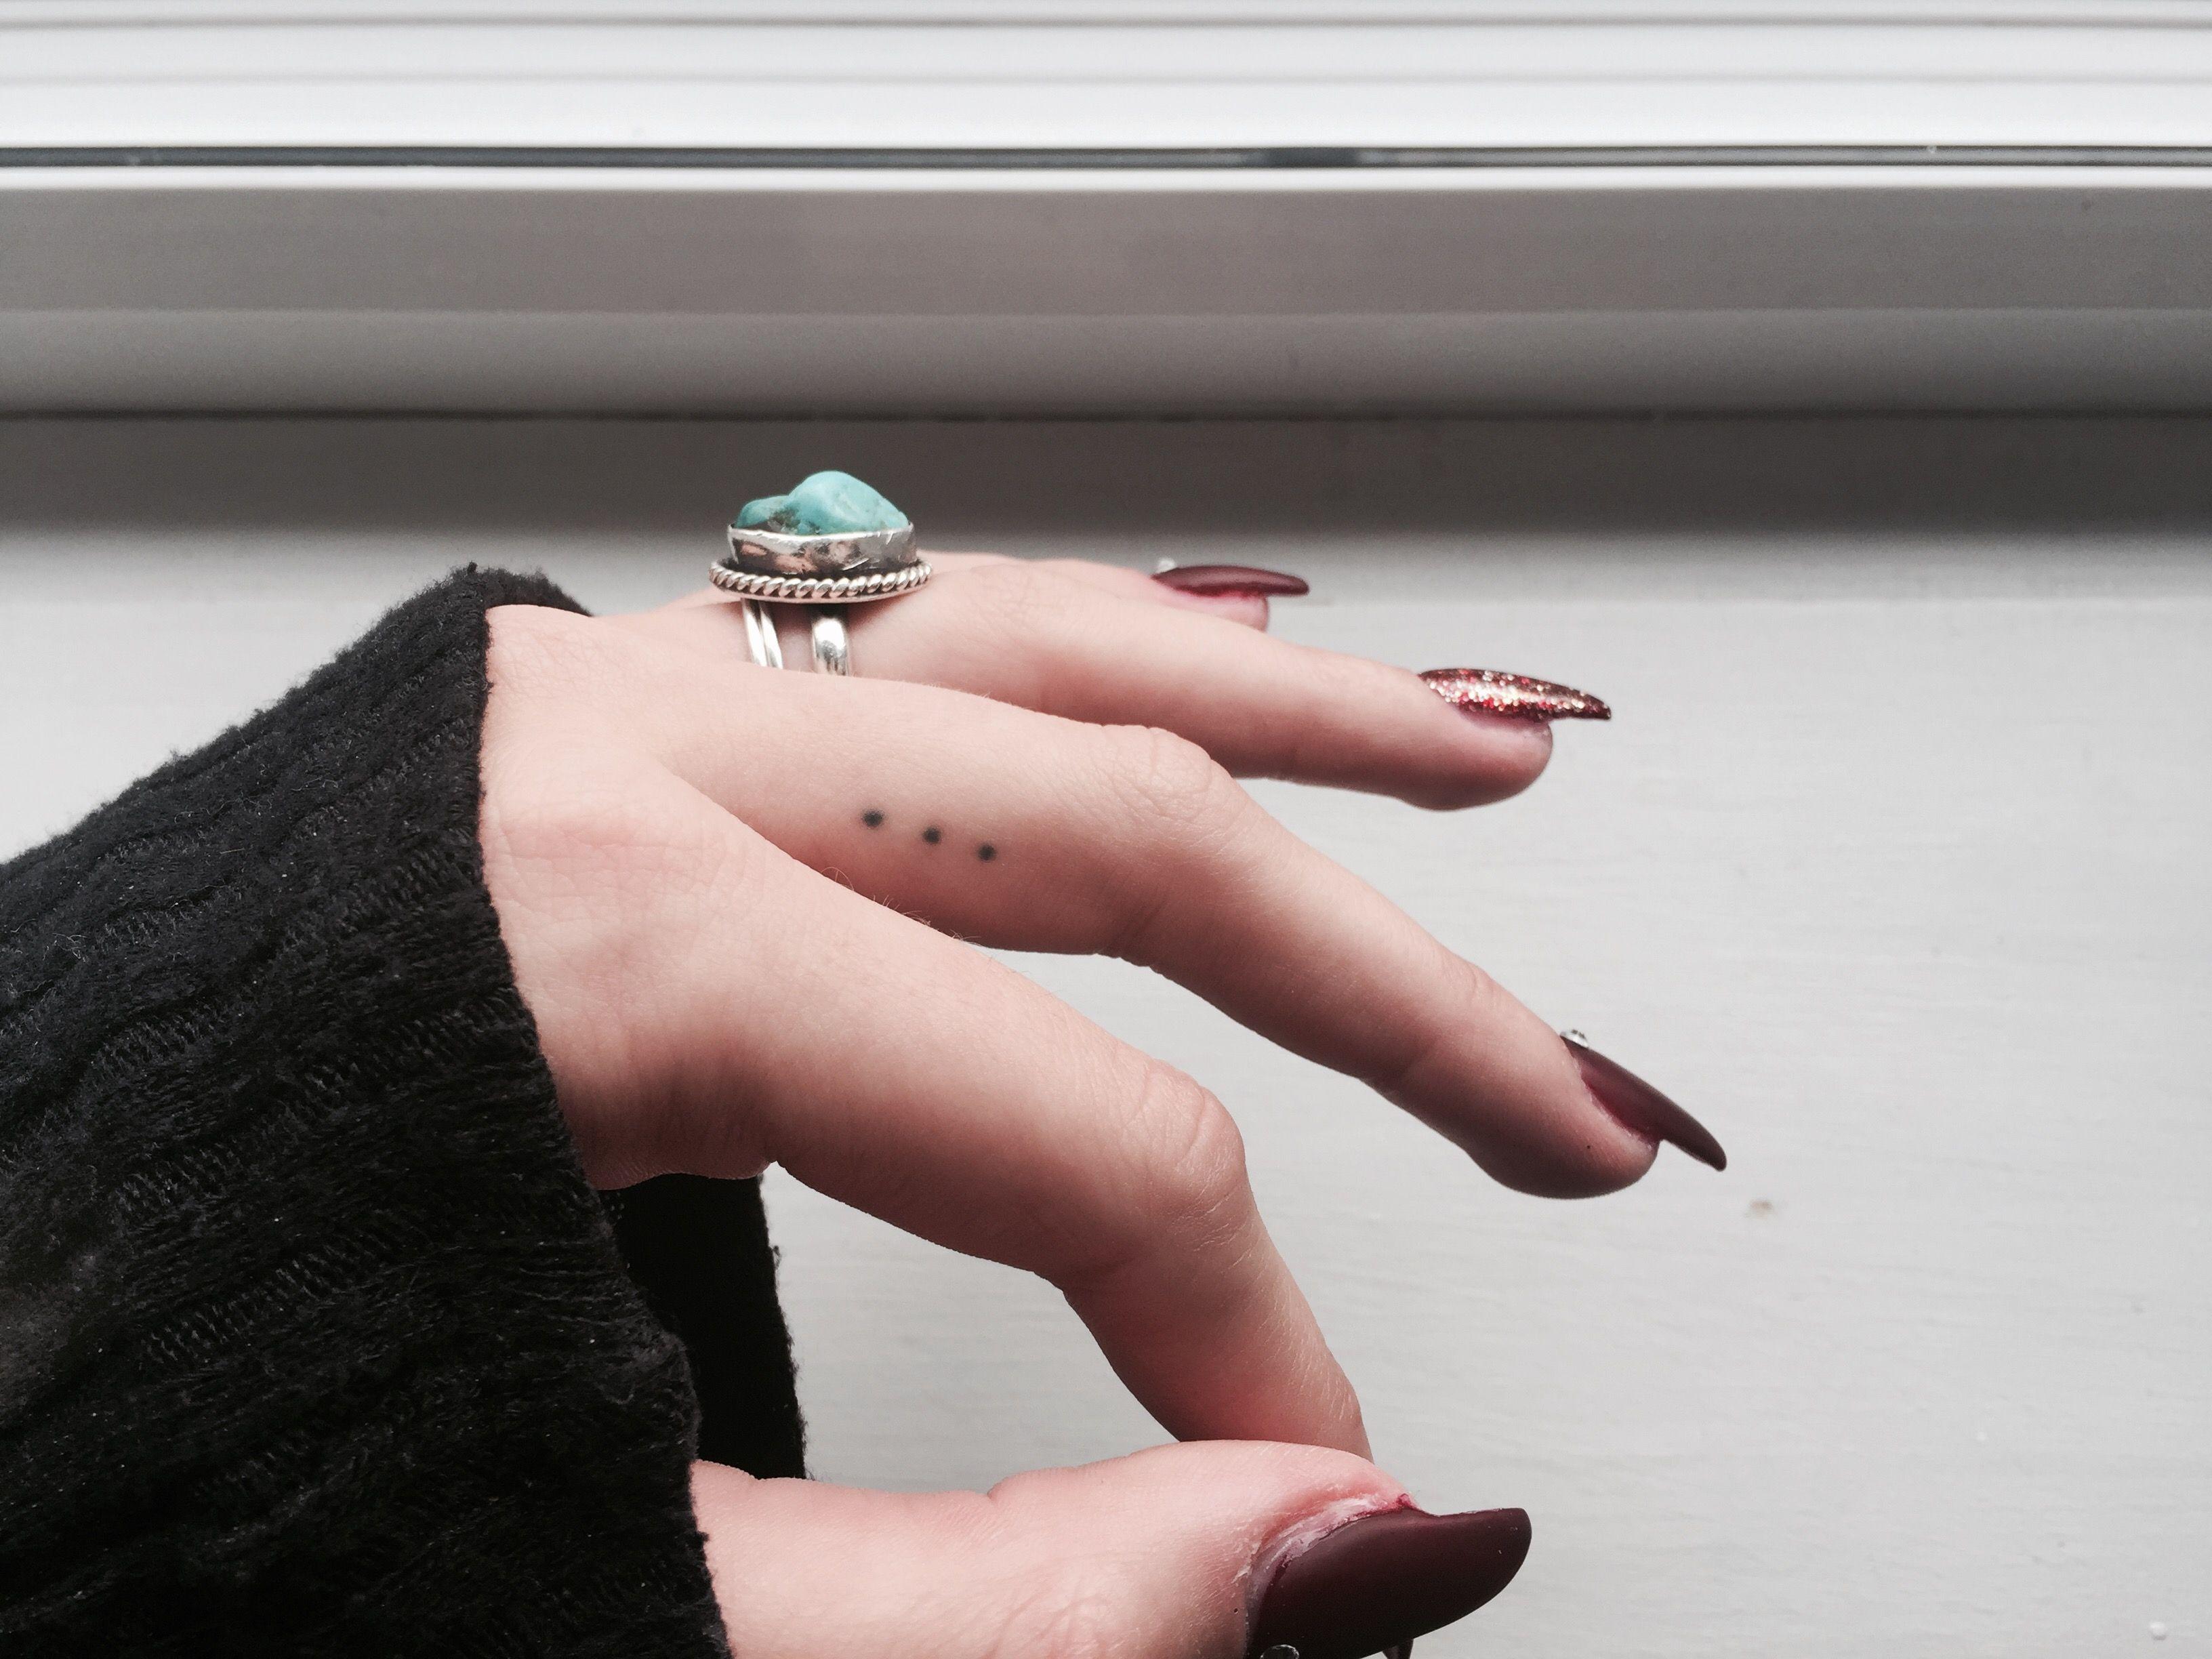 Small Hidden Tattoos Ellipsis Has Same Meaning As Semicolon Tattoo Small Tattoo Semicolon Tinytattoo H Tatuajes De Puntos Tatuajes Minimalistas Tatuajes